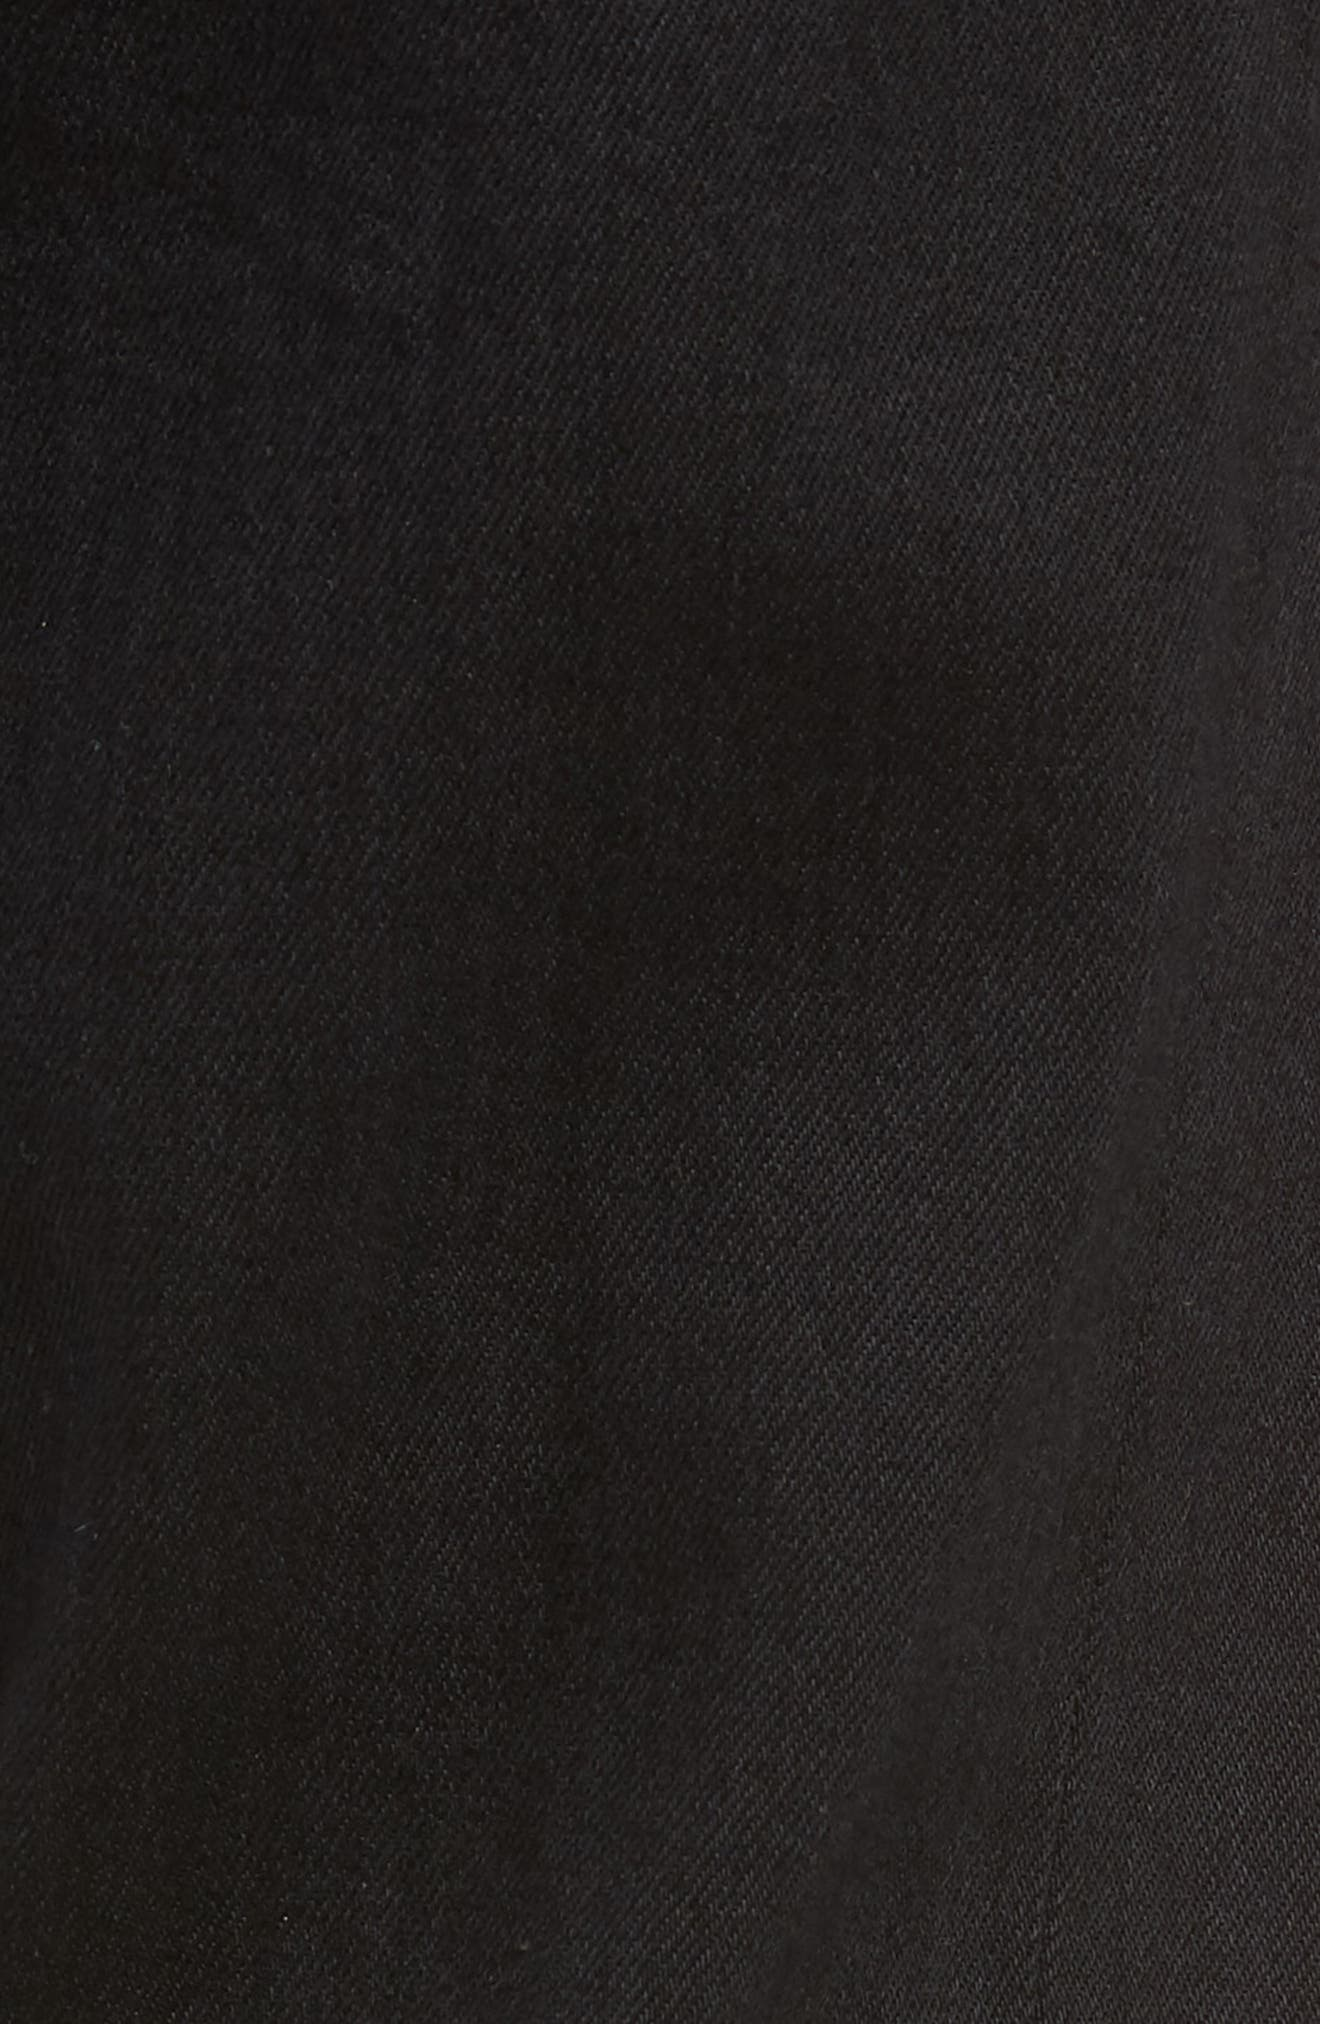 Lou Slim Fit Jeans,                             Alternate thumbnail 5, color,                             BLACK SELVEDGE